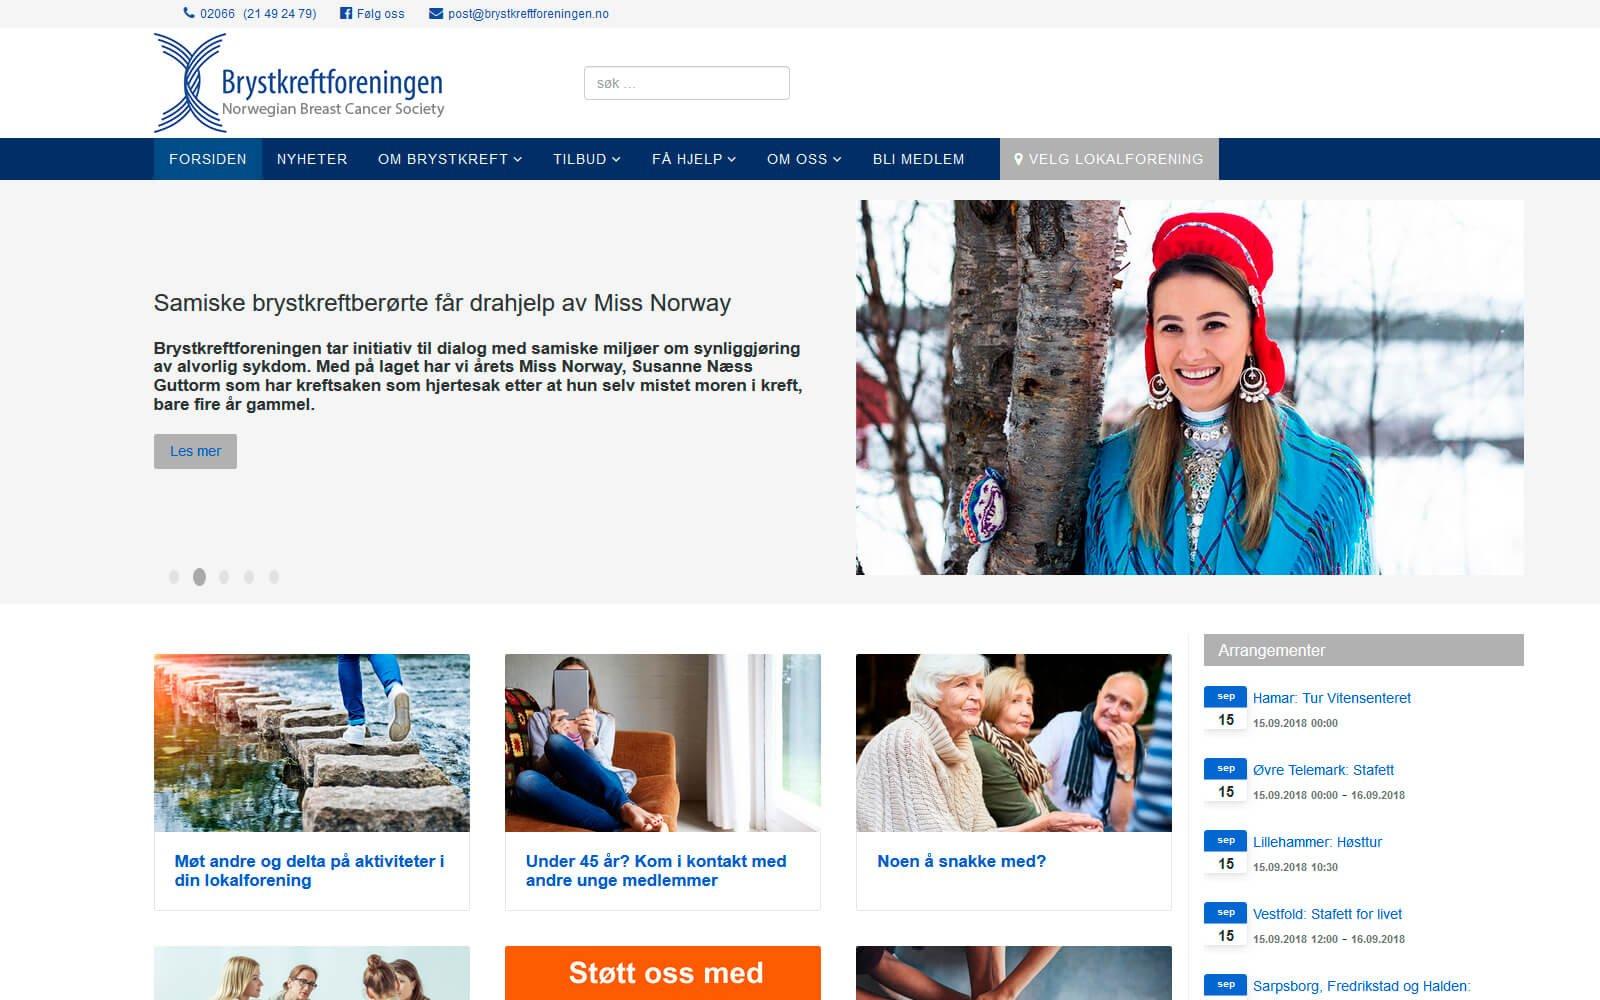 Brystkreftforeningen webside